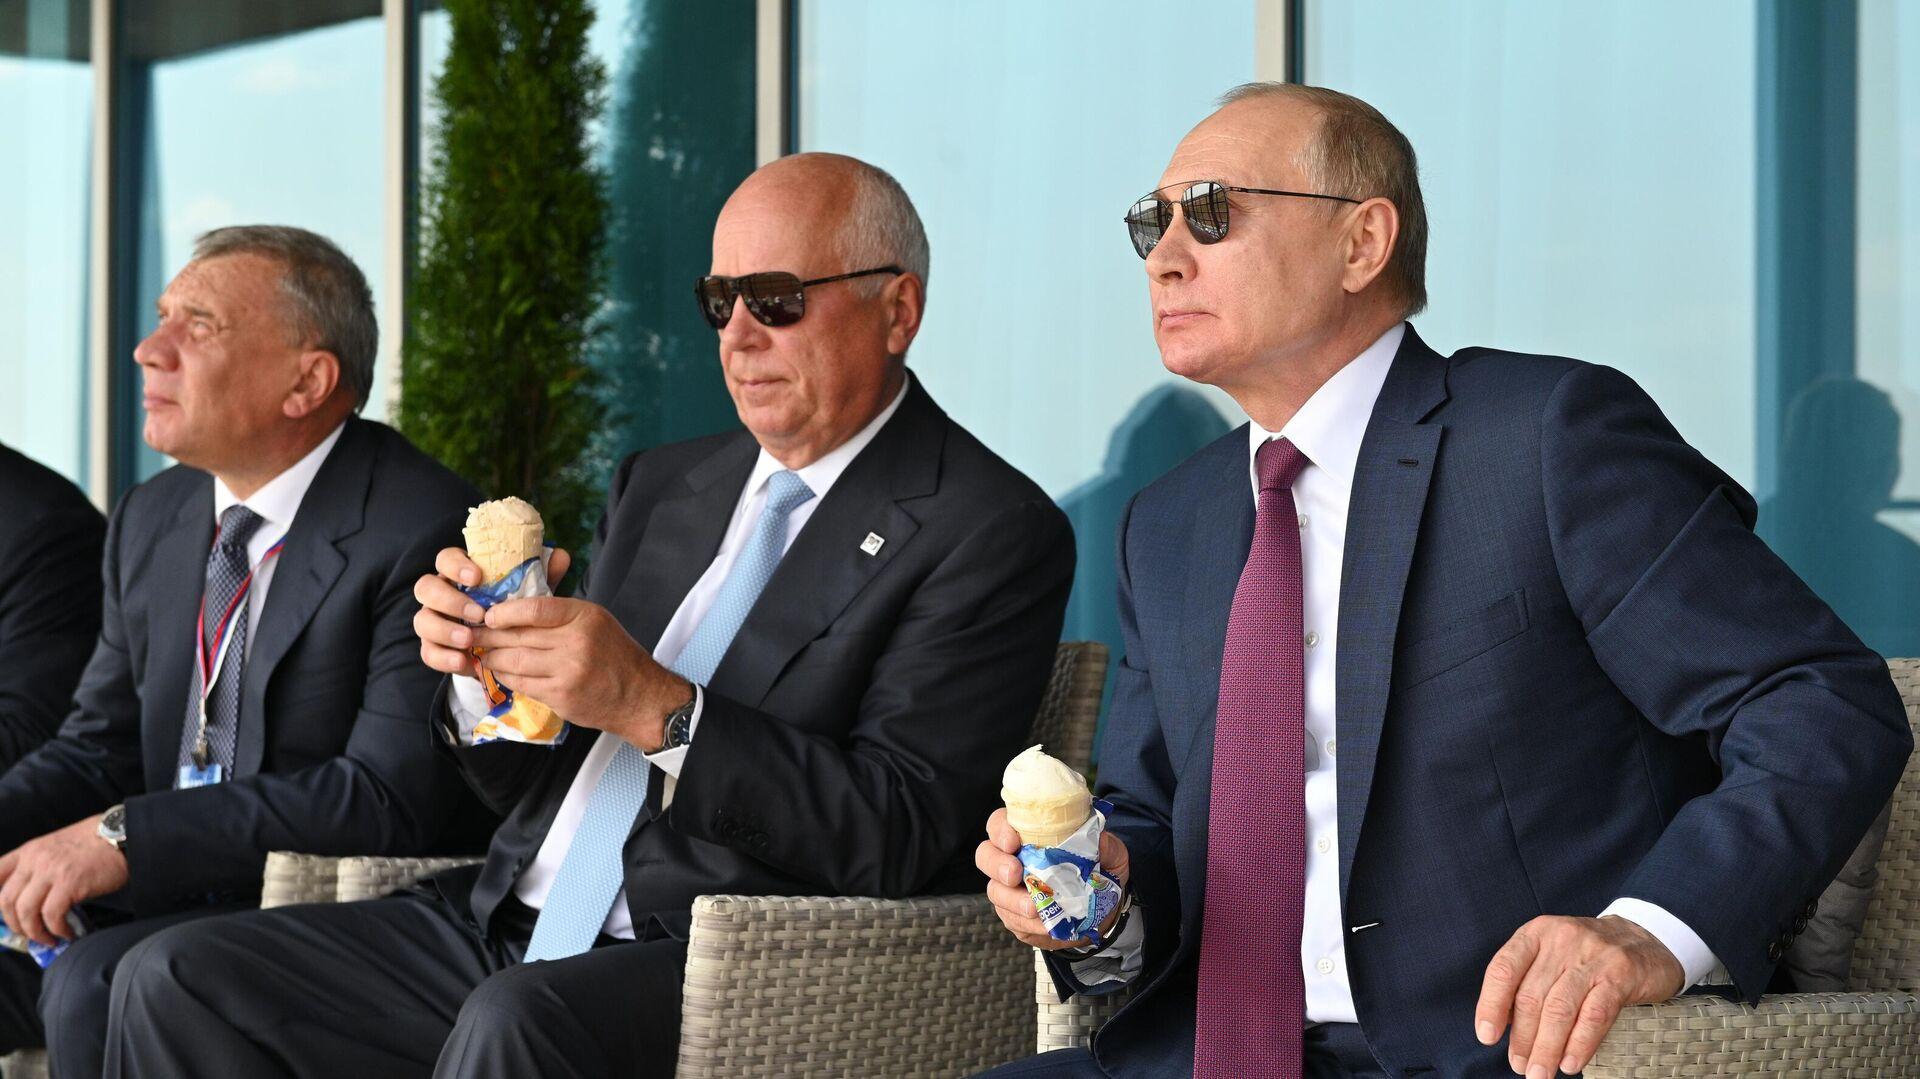 Президент РФ Владимир Путин на Международном авиационно-космическом салоне МАКС-2021 - РИА Новости, 1920, 20.07.2021